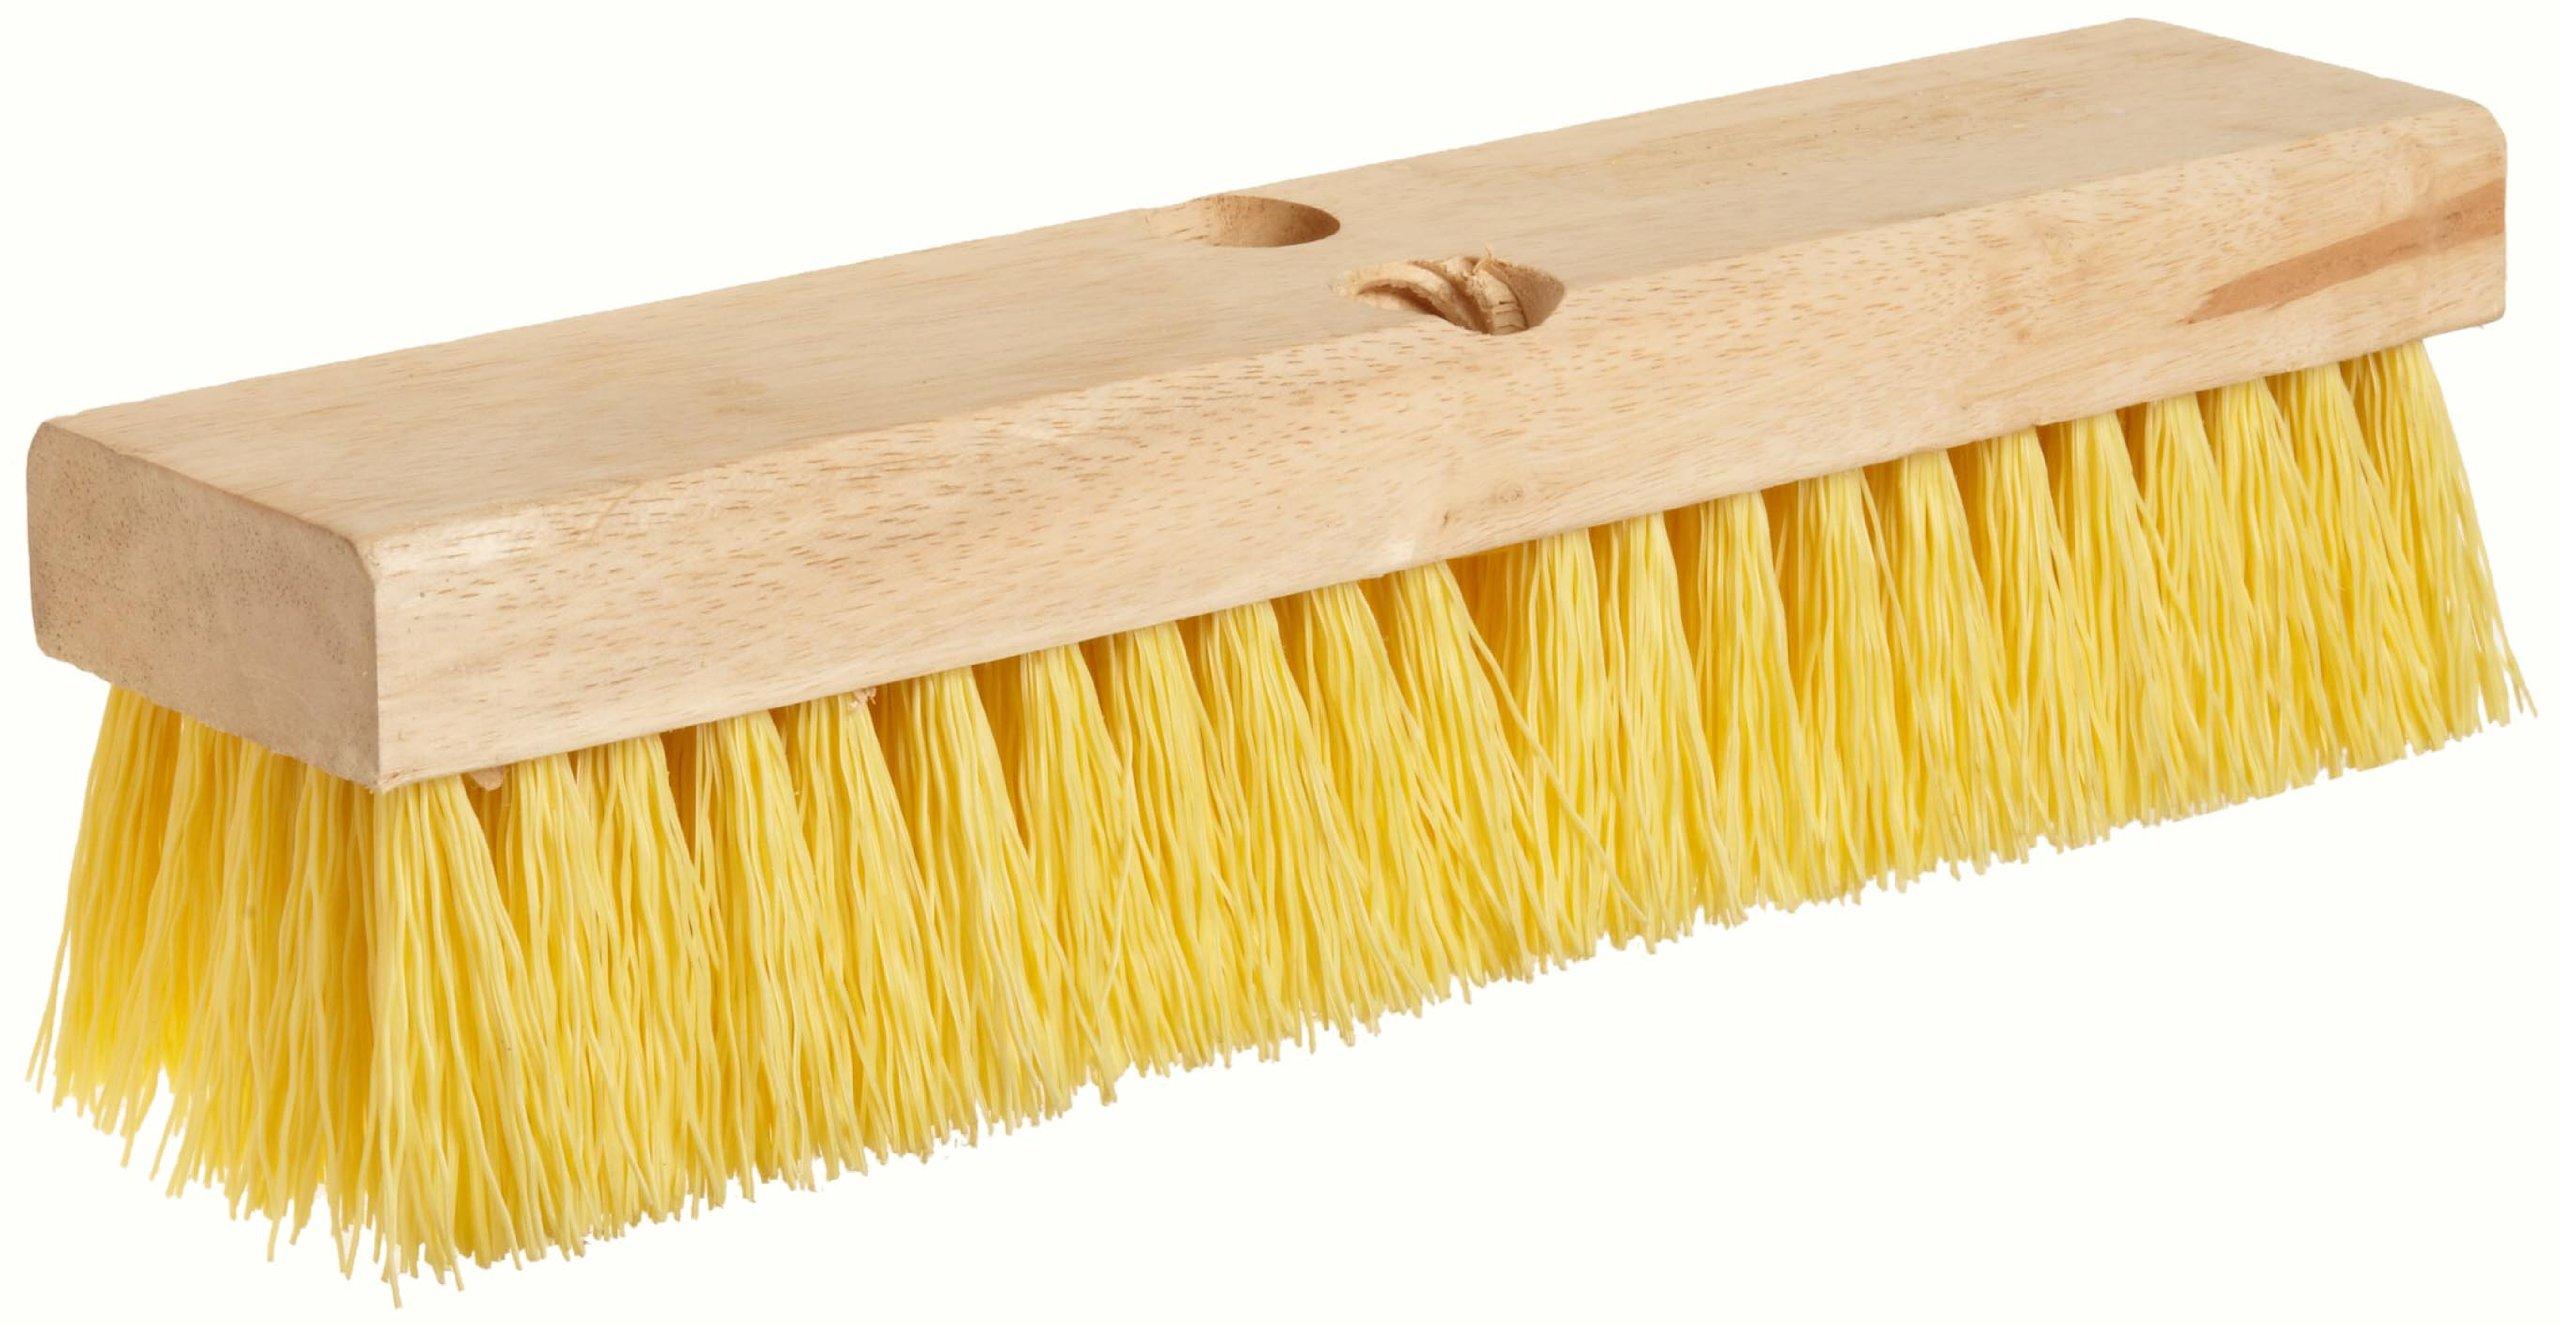 Weiler 44438 12'' Block Size, 6 X 20 No. Of Rows, Wood Block, Polypropylene Fill, Deck Scrub Brush